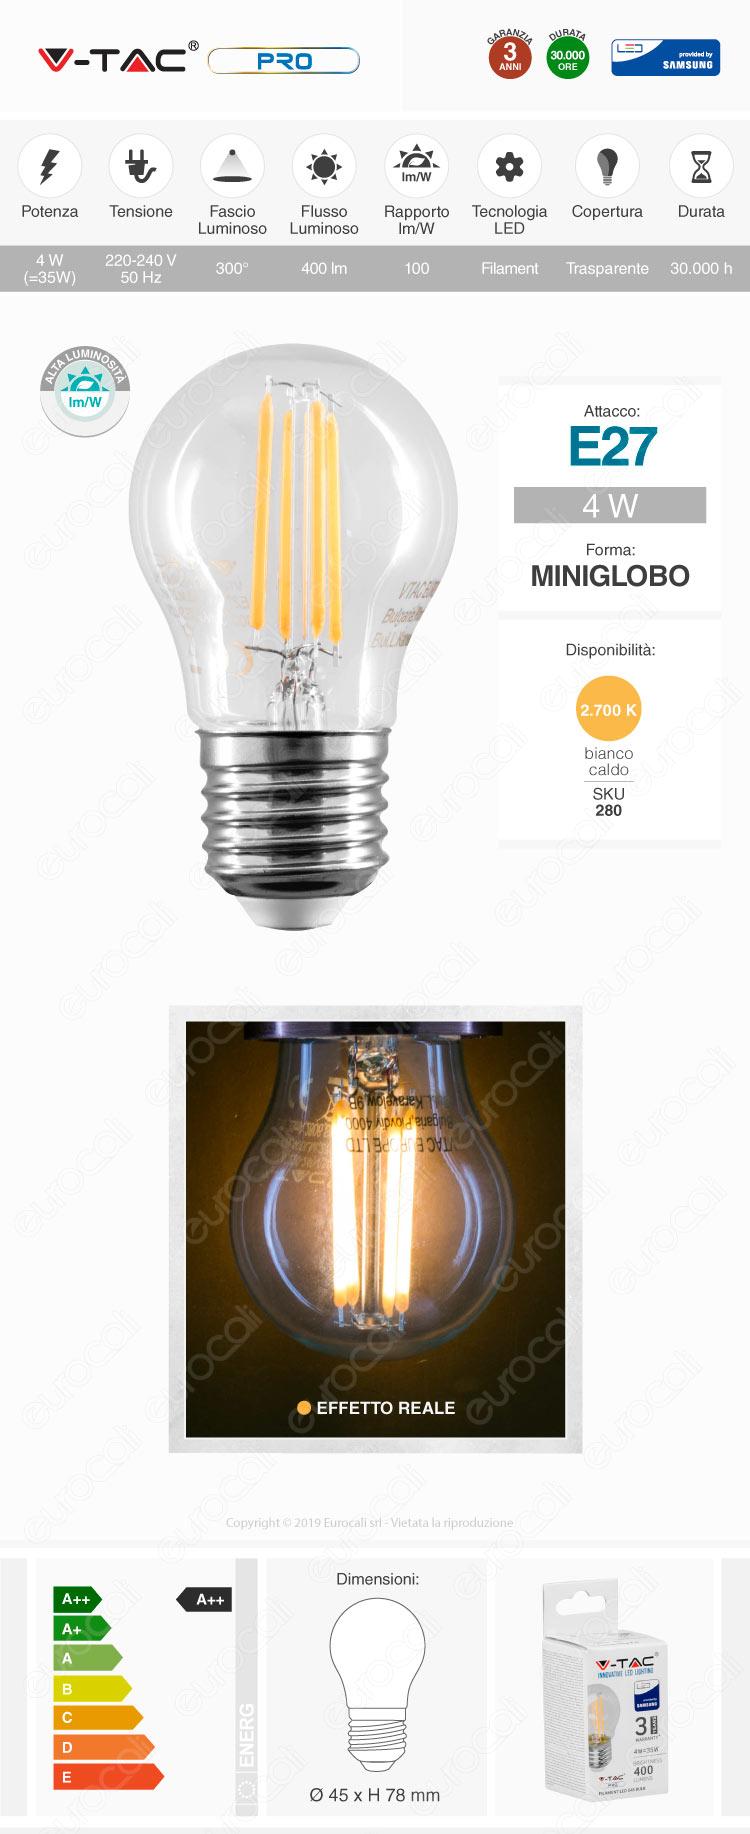 V-Tac VT-244 Lampadina LED E27 4W Filament MiniGlobo